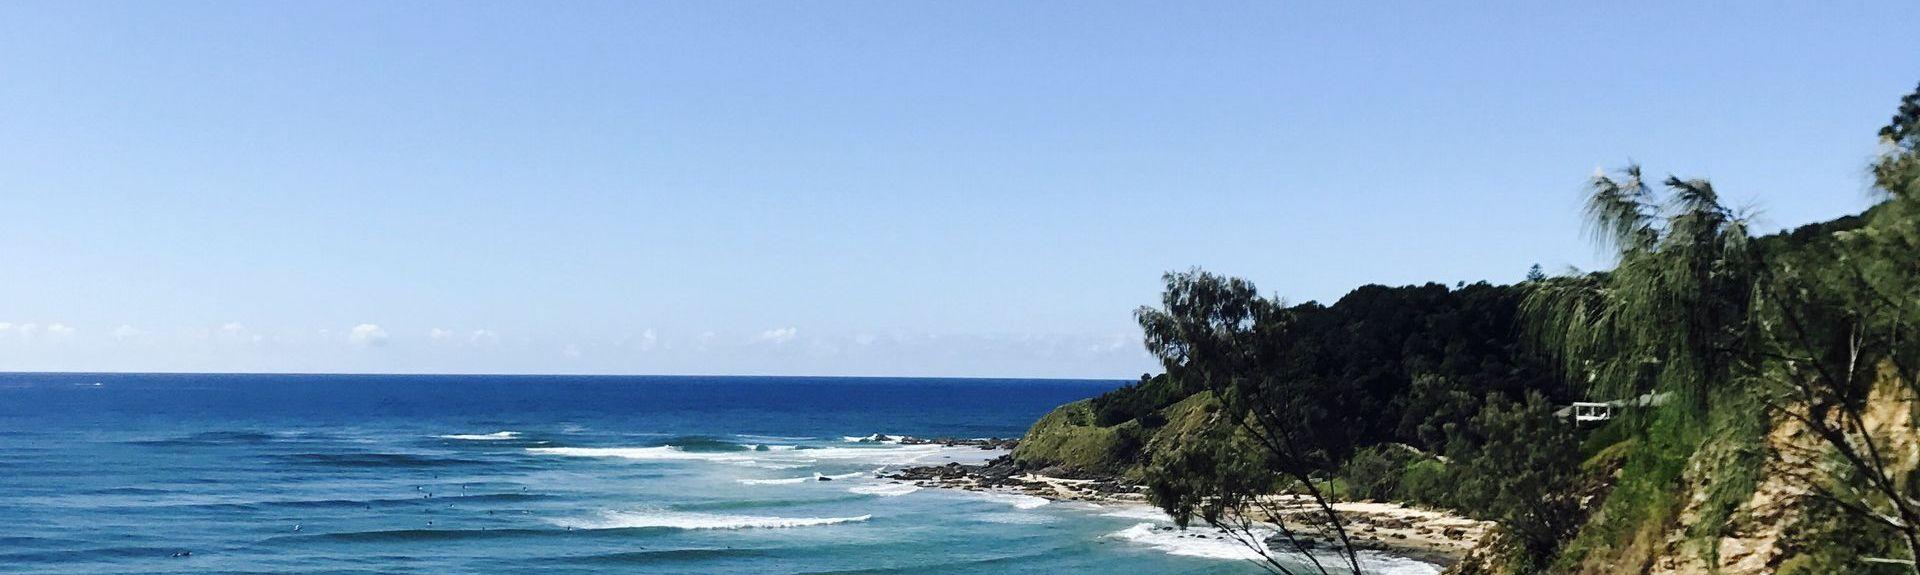 Repentance Creek NSW, Australia